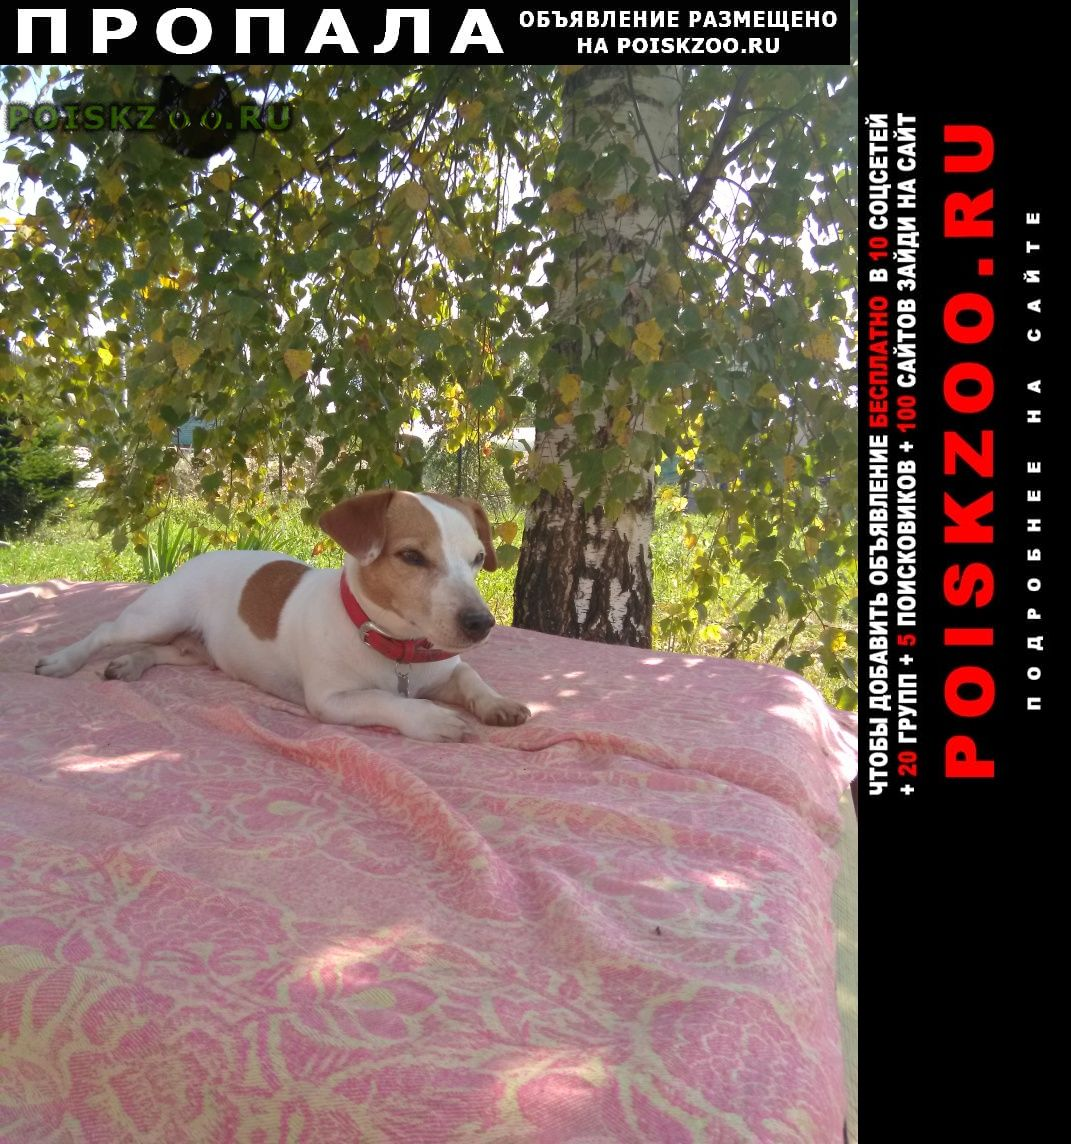 Пропала собака ищем более трёх месяцев, думаем вывезена г.Серпухов